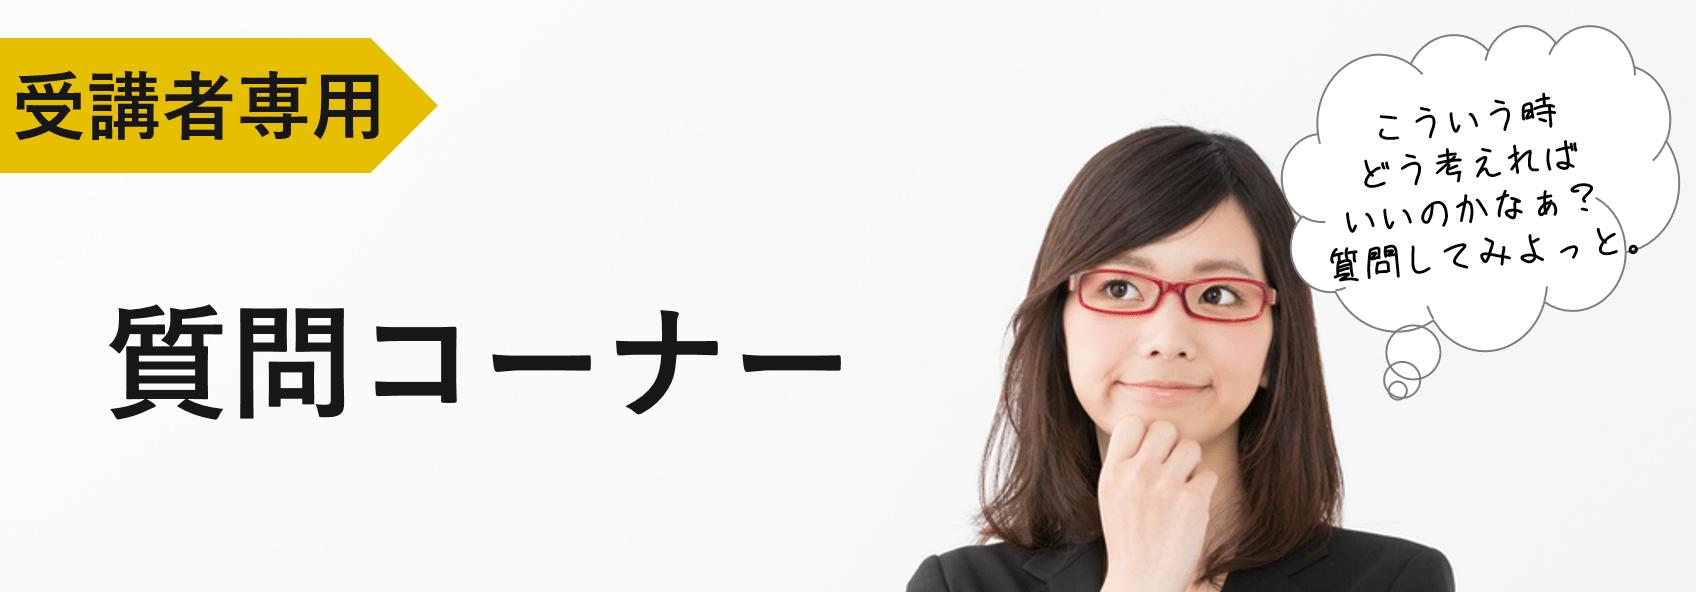 【受講者専用】質問コーナー